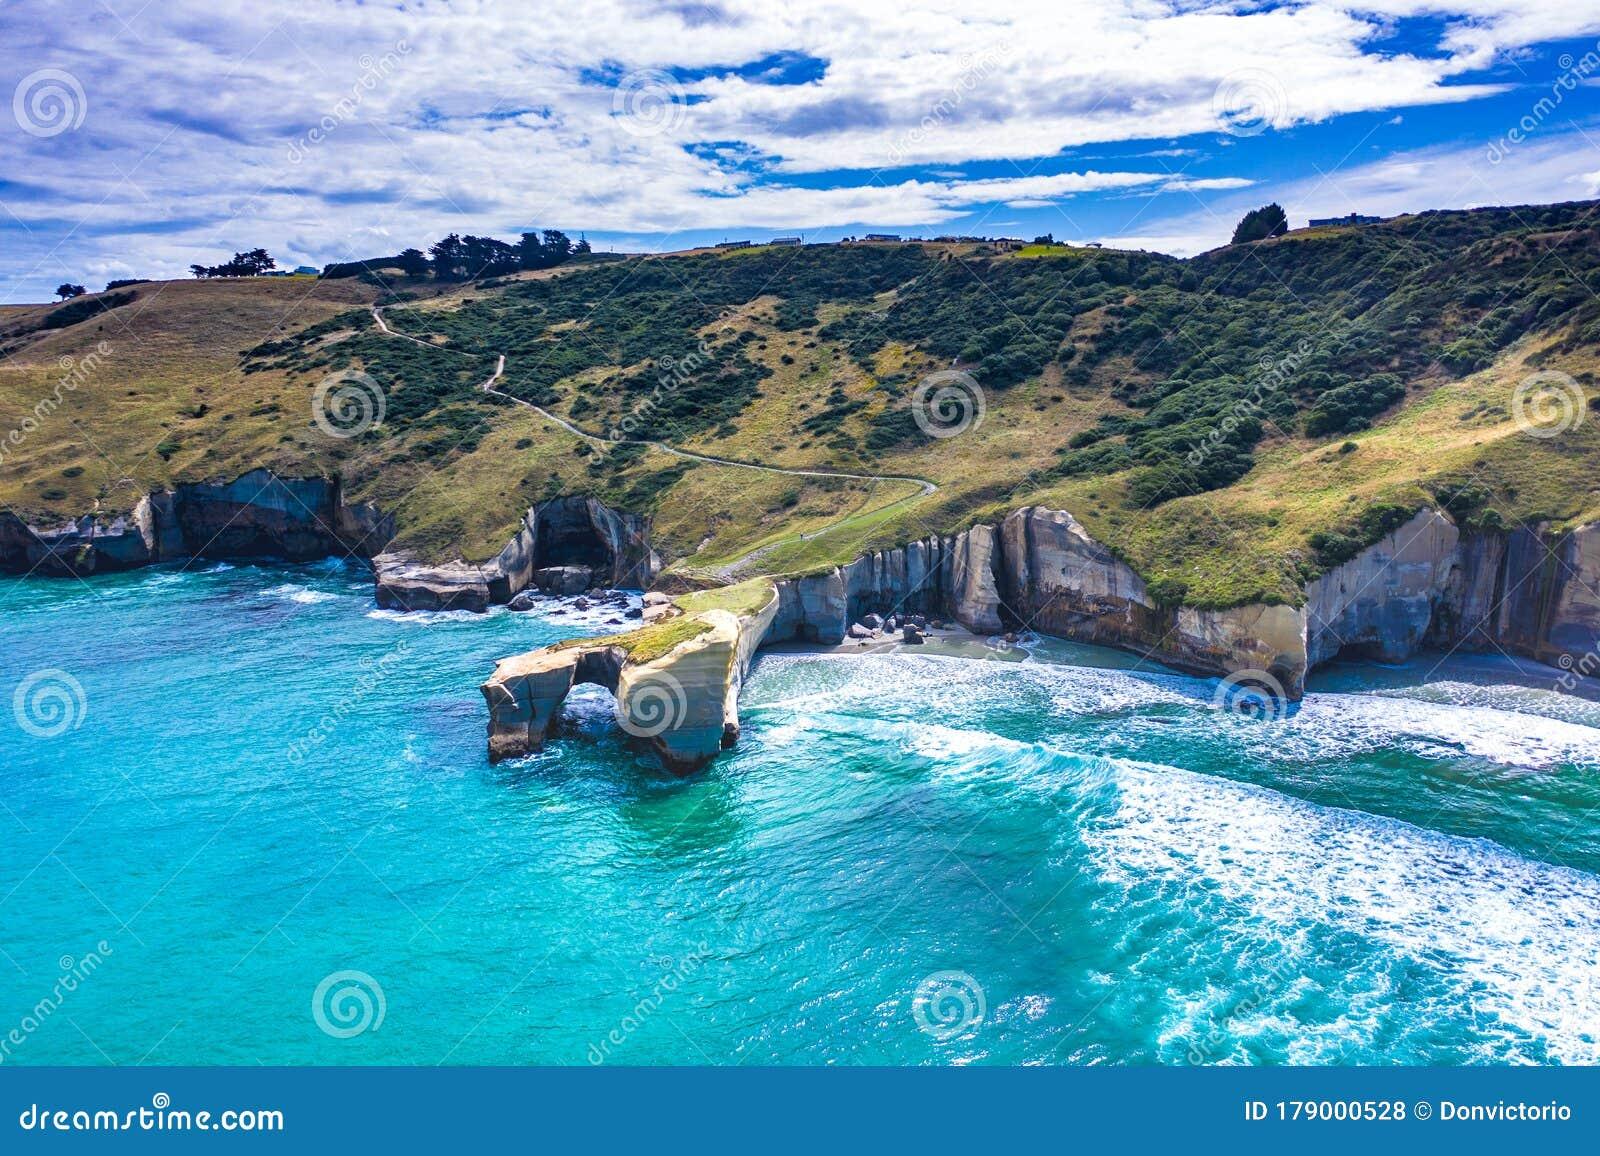 Tunnel Beach Dunedin New Zealand Aerial View Stock Photo Image Of Landscape Coastline 179000528